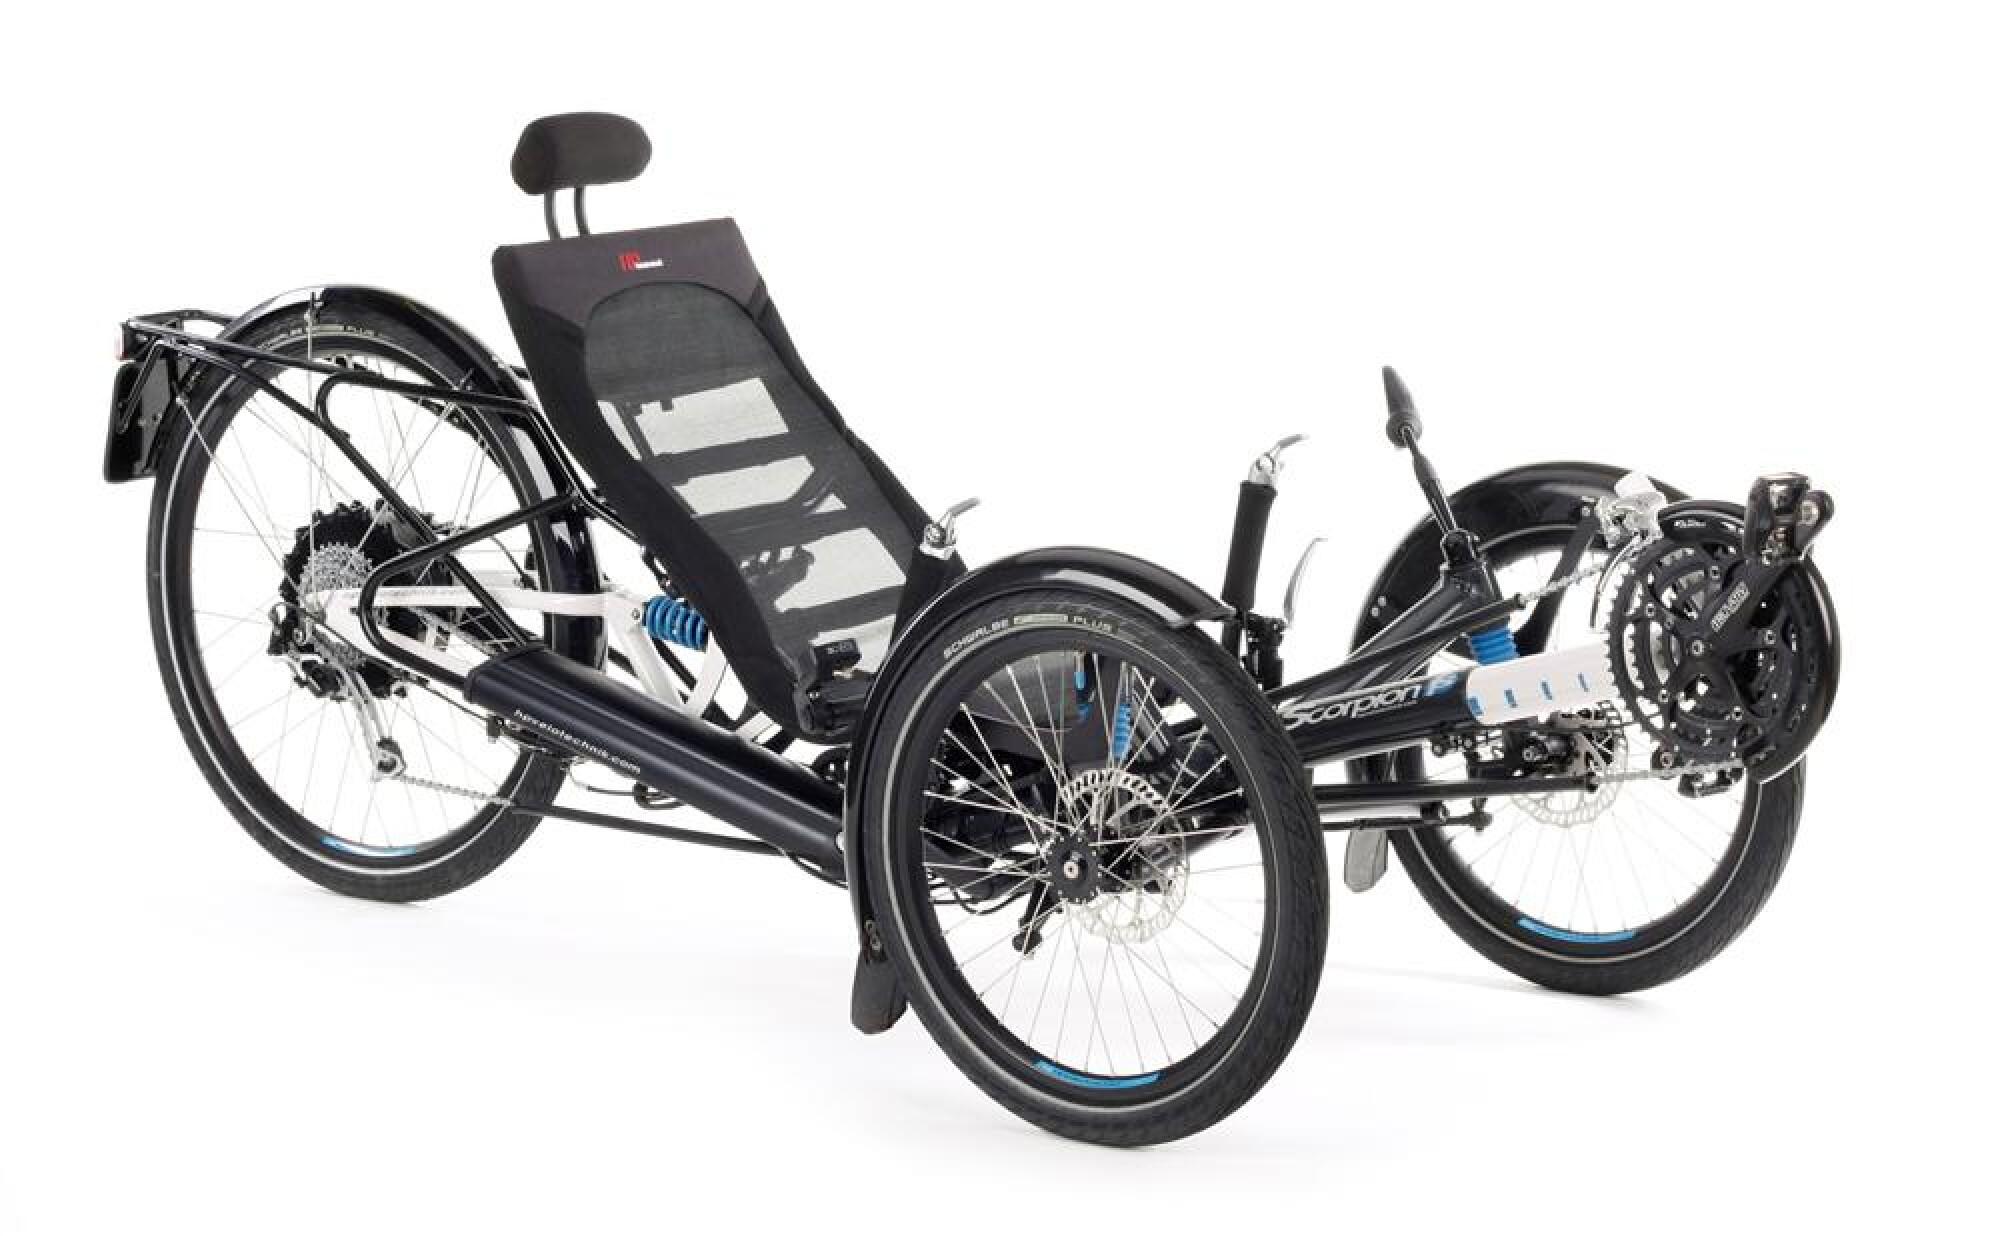 liegerad hp velotechnik scorpion fs 26 s pedelec 2016 bei. Black Bedroom Furniture Sets. Home Design Ideas